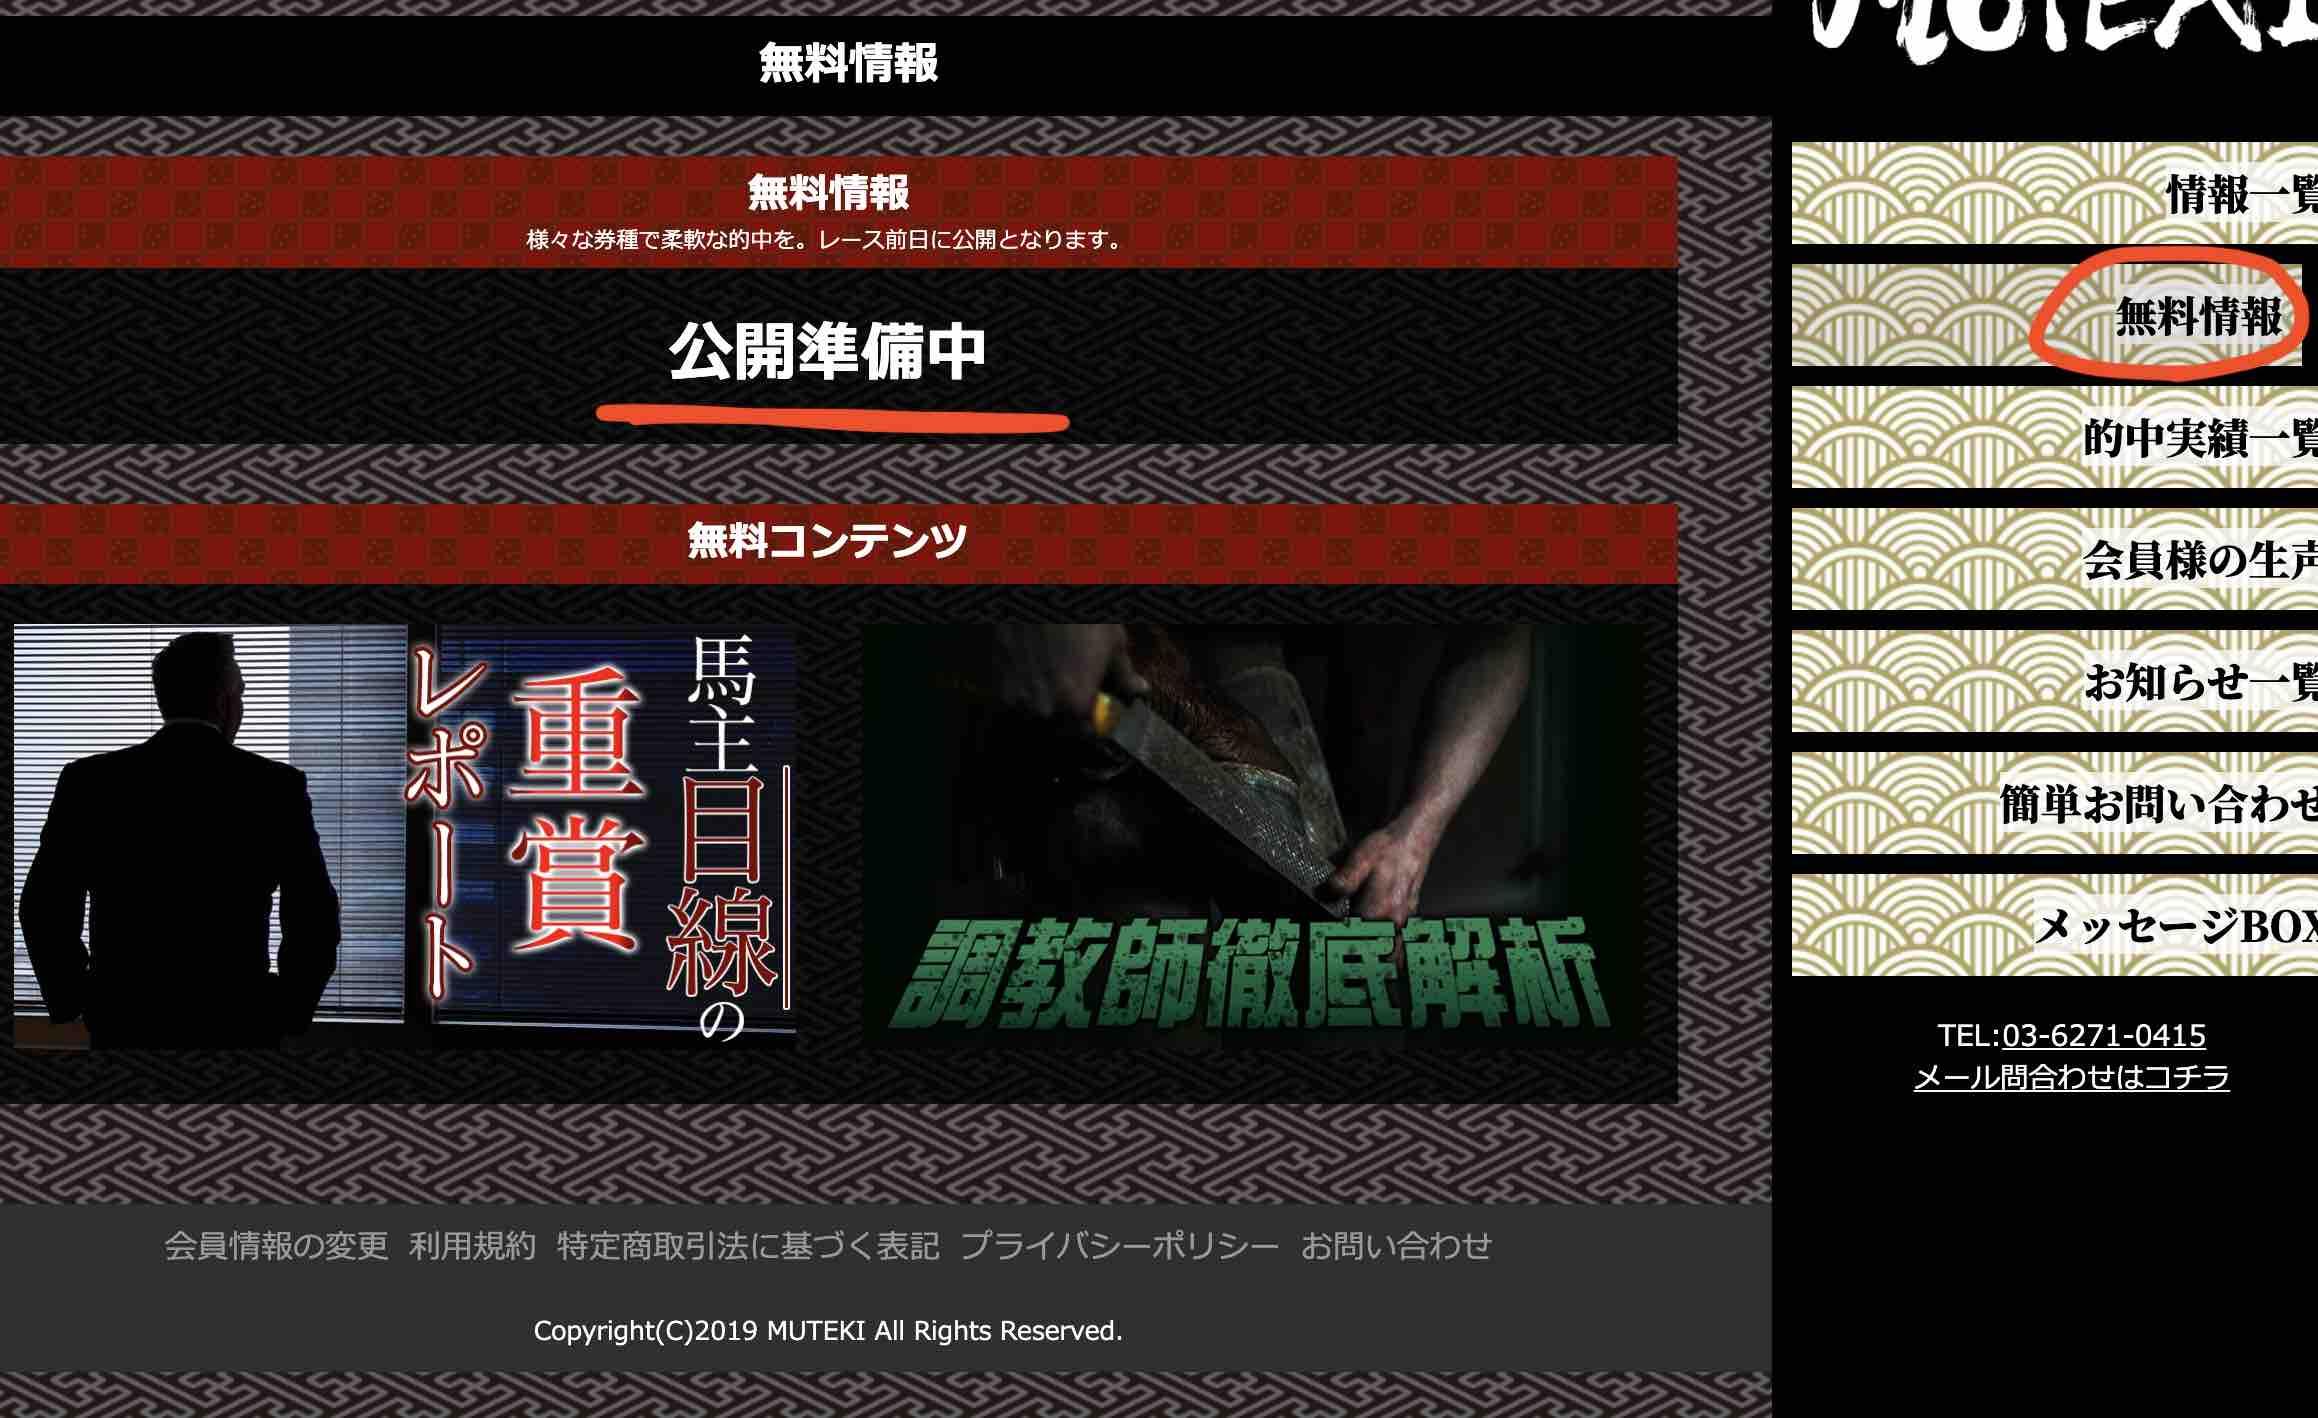 MUTEKIという競馬予想サイトはまだ未完成